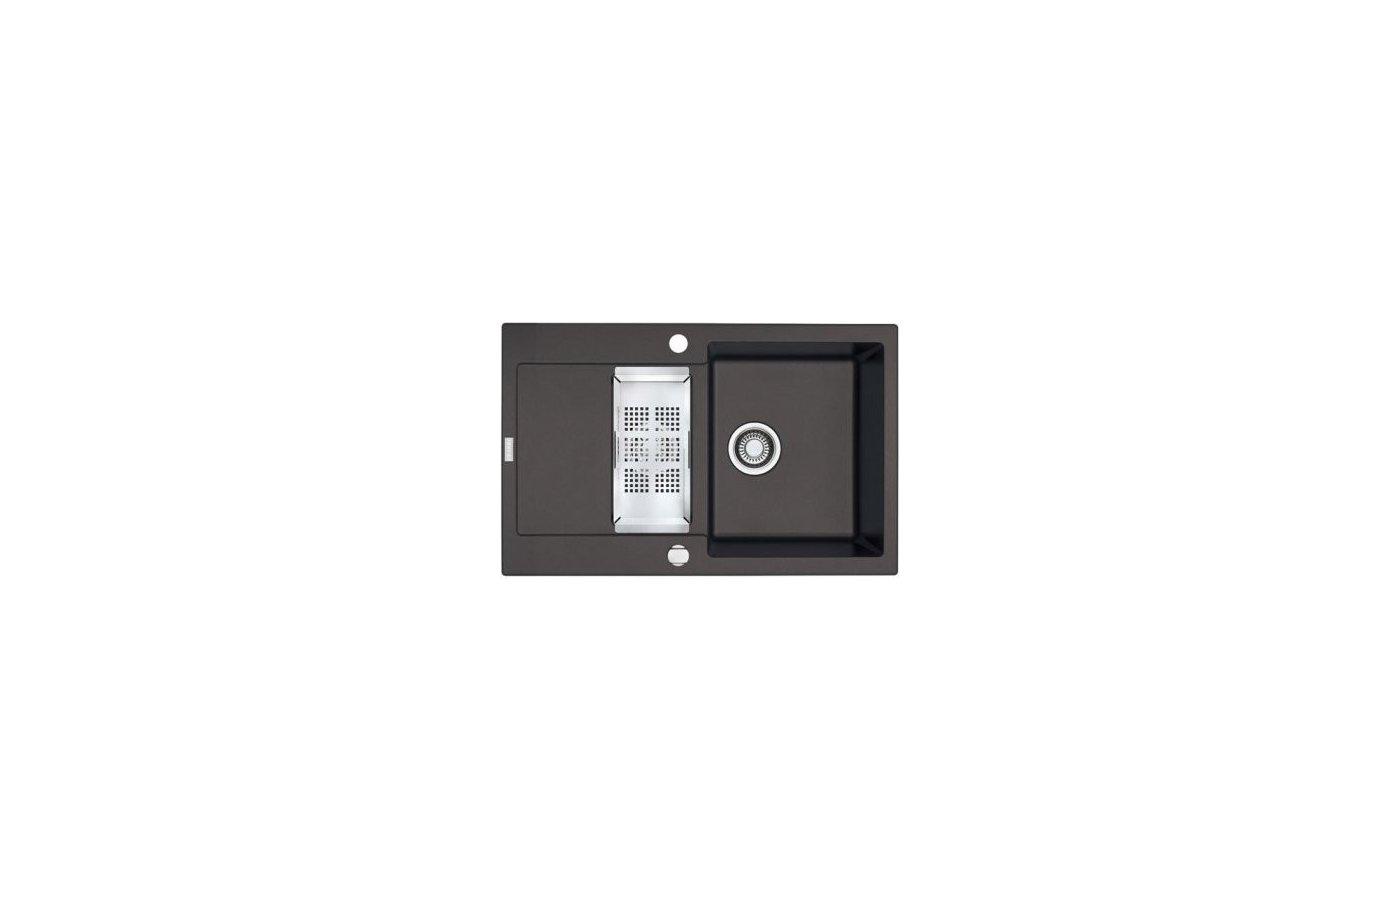 Кухонная мойка FRANKE MRG 651-78 оникс